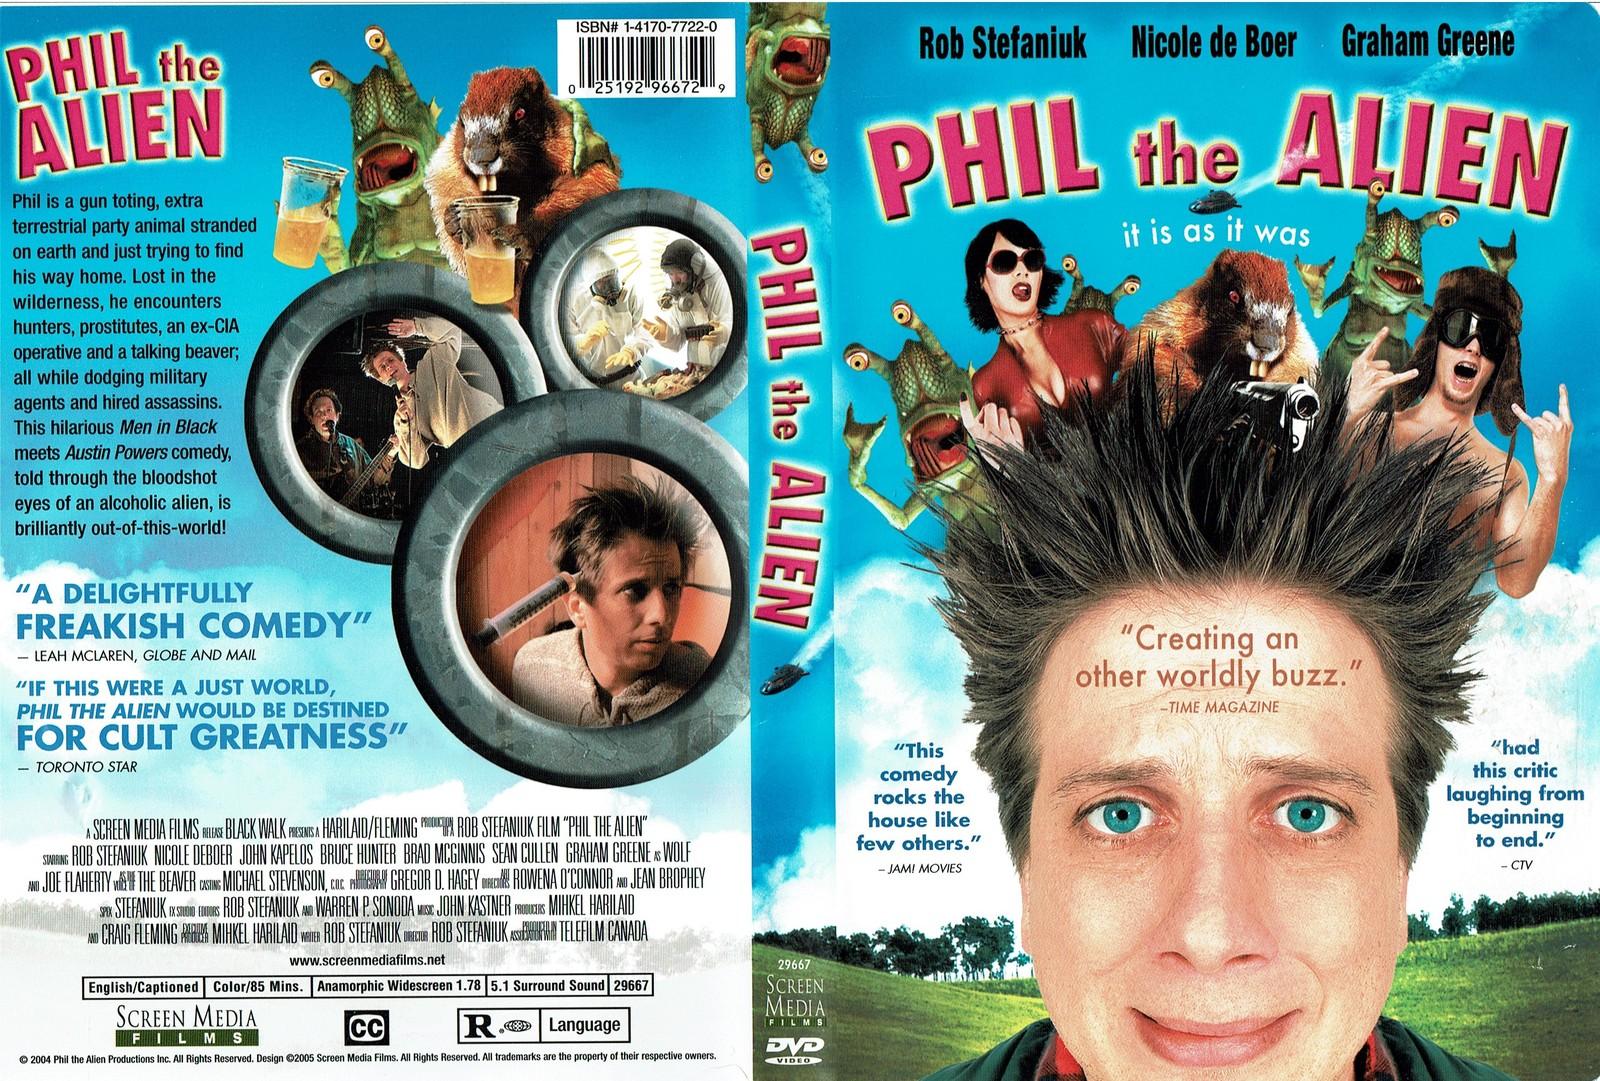 Phil the Alien, Starring Boyd Banks, Christopher Barry, DVD, Very Good